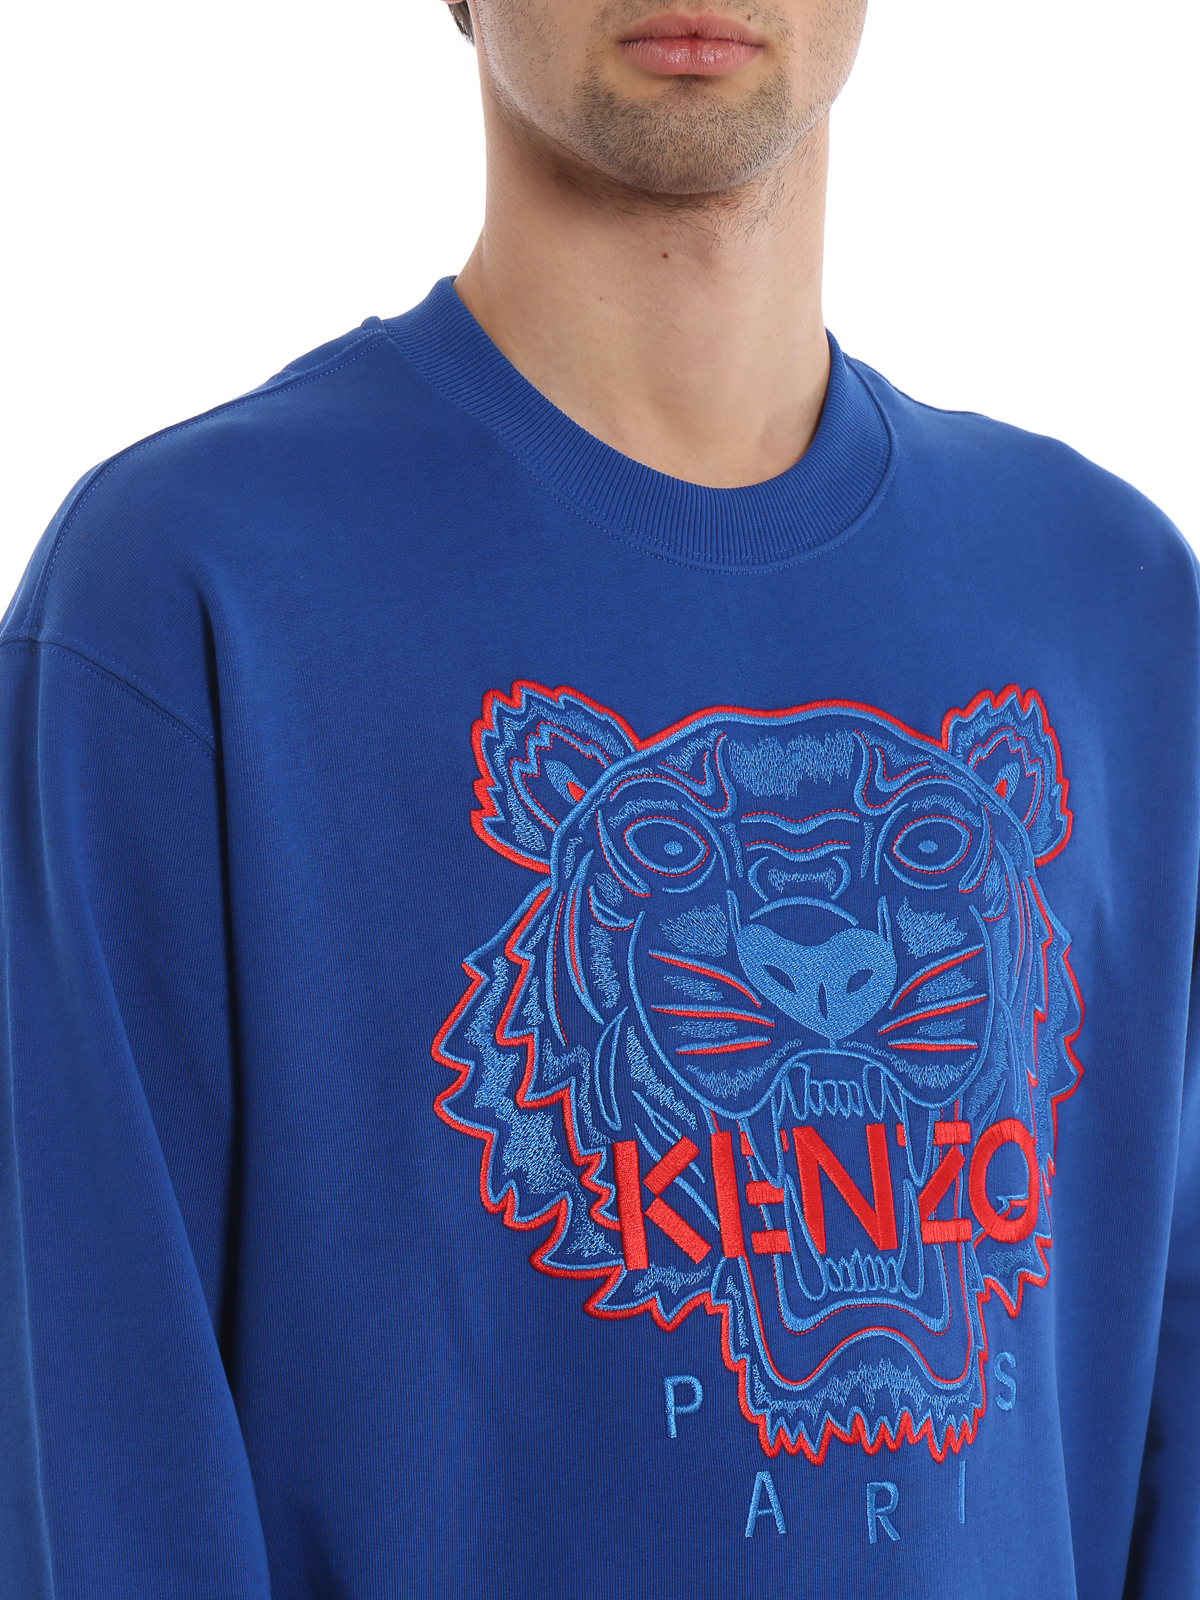 Kenzo - Two-tone cotton Tiger classic sweatshirt - Sweatshirts ... 22a66be2ec2